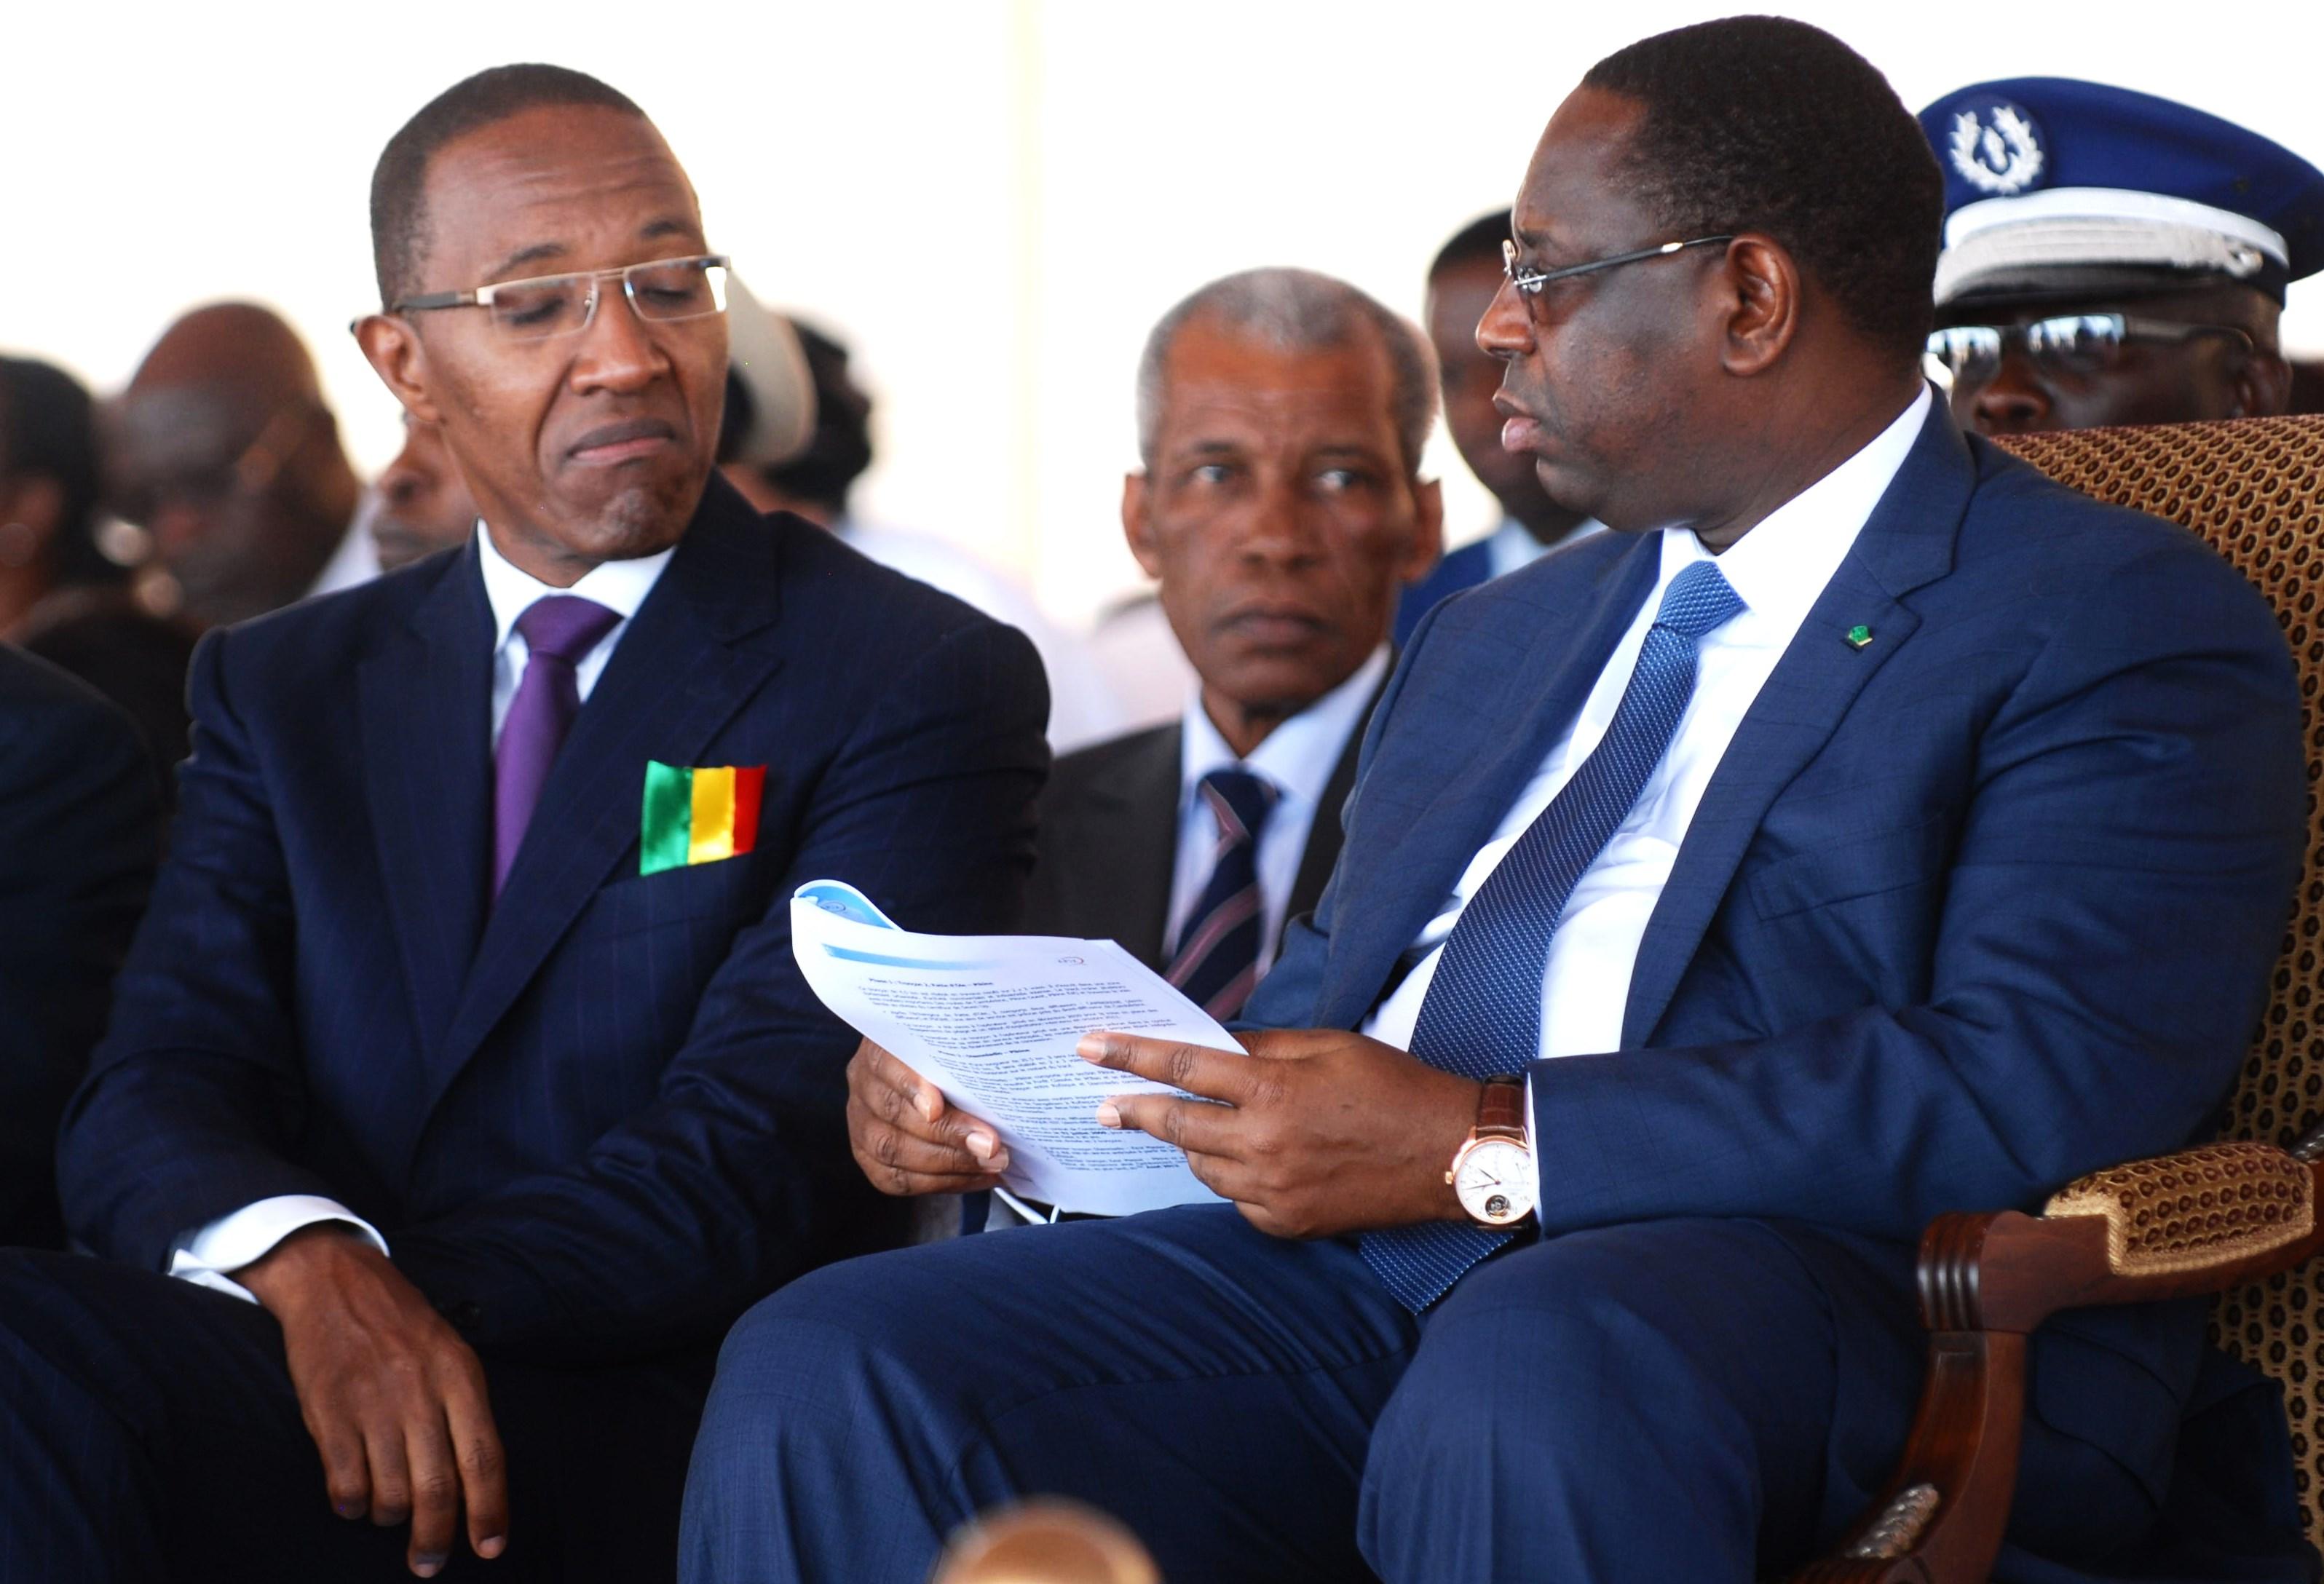 Macky traque Abdoul Mbaye, Malick Gackou,  Ousmane Sonko, Nafi Ngom Keïta, Khalifa Sall,Pape Diop...